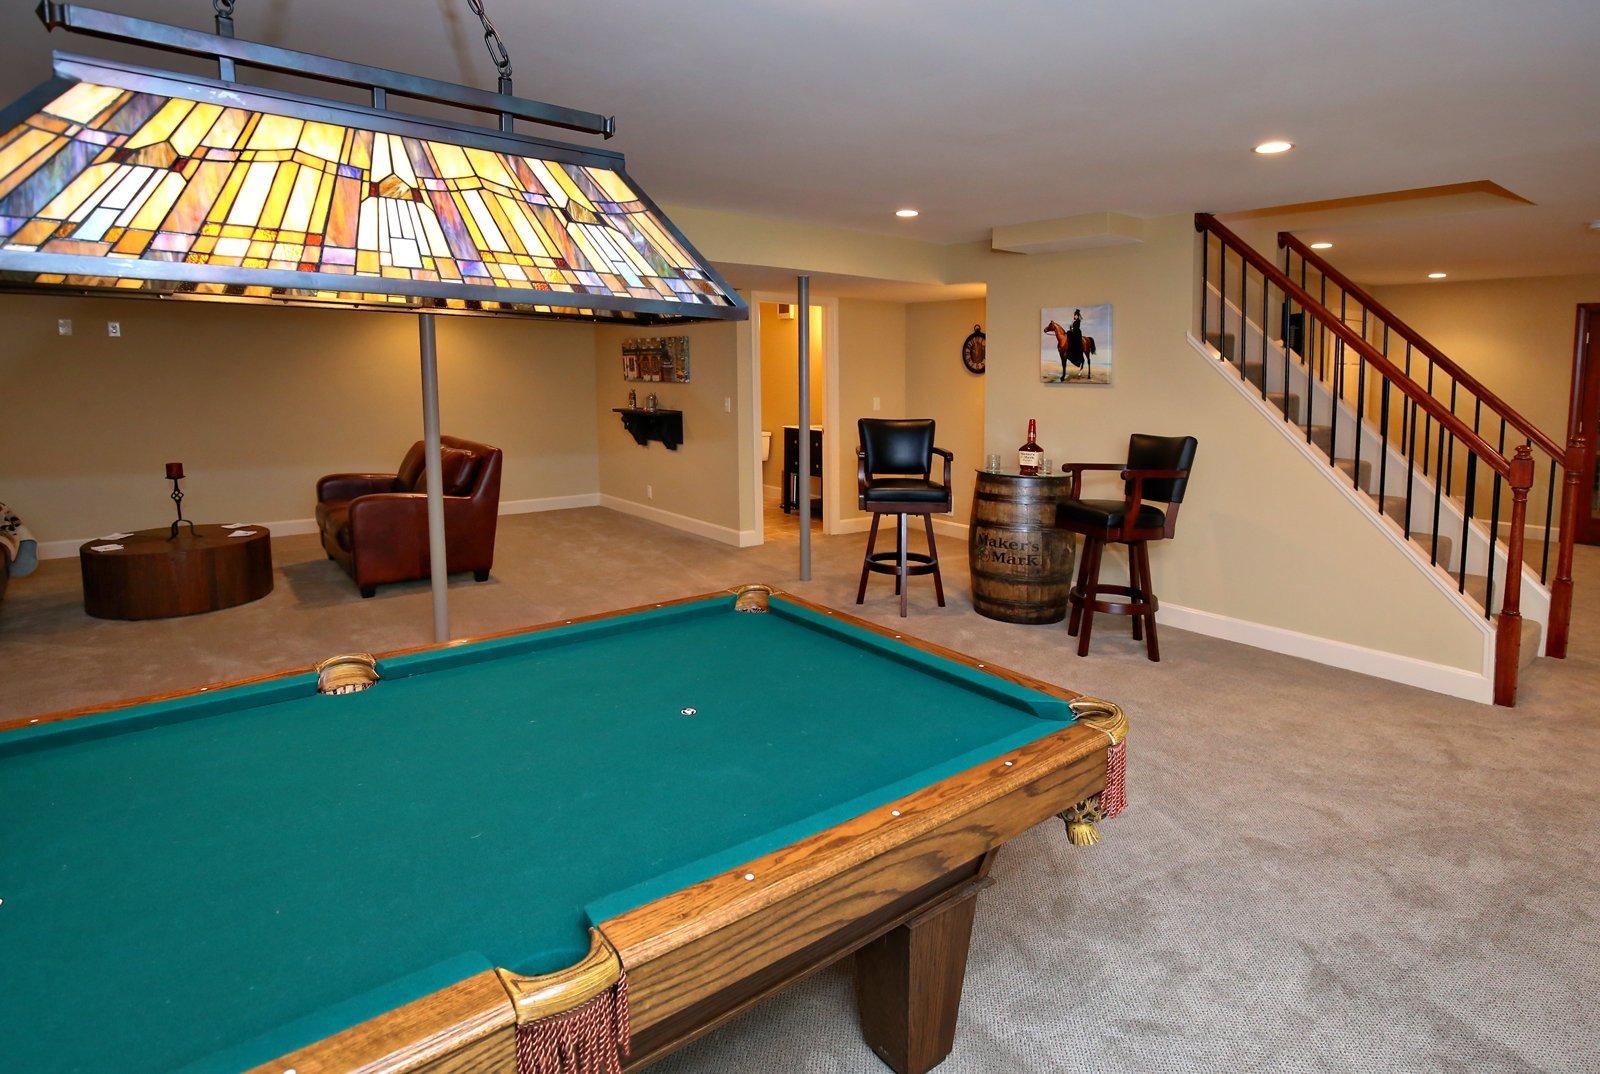 Basement Pool Room Remodel in Louisville KY